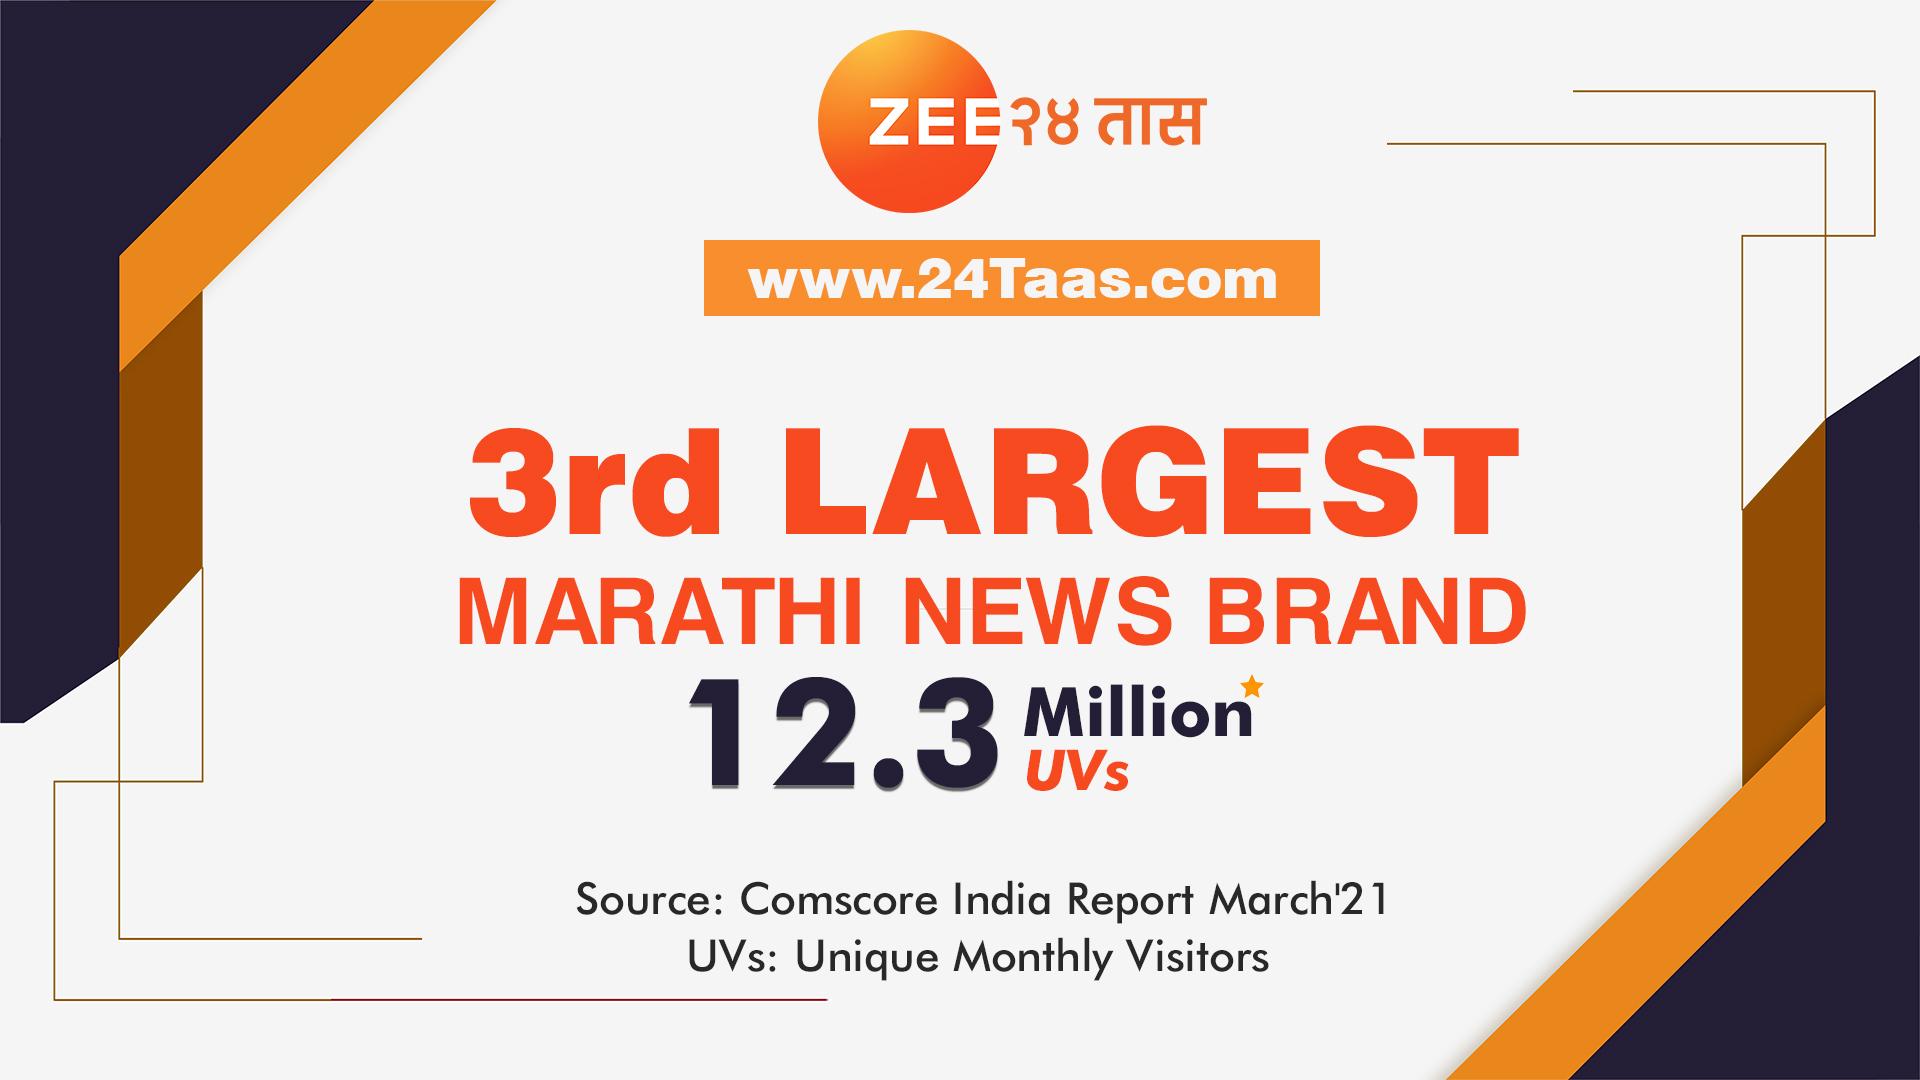 Marathi news brand 24Taas.com raised itself to the 3rd position on Comscore among Marathi ...